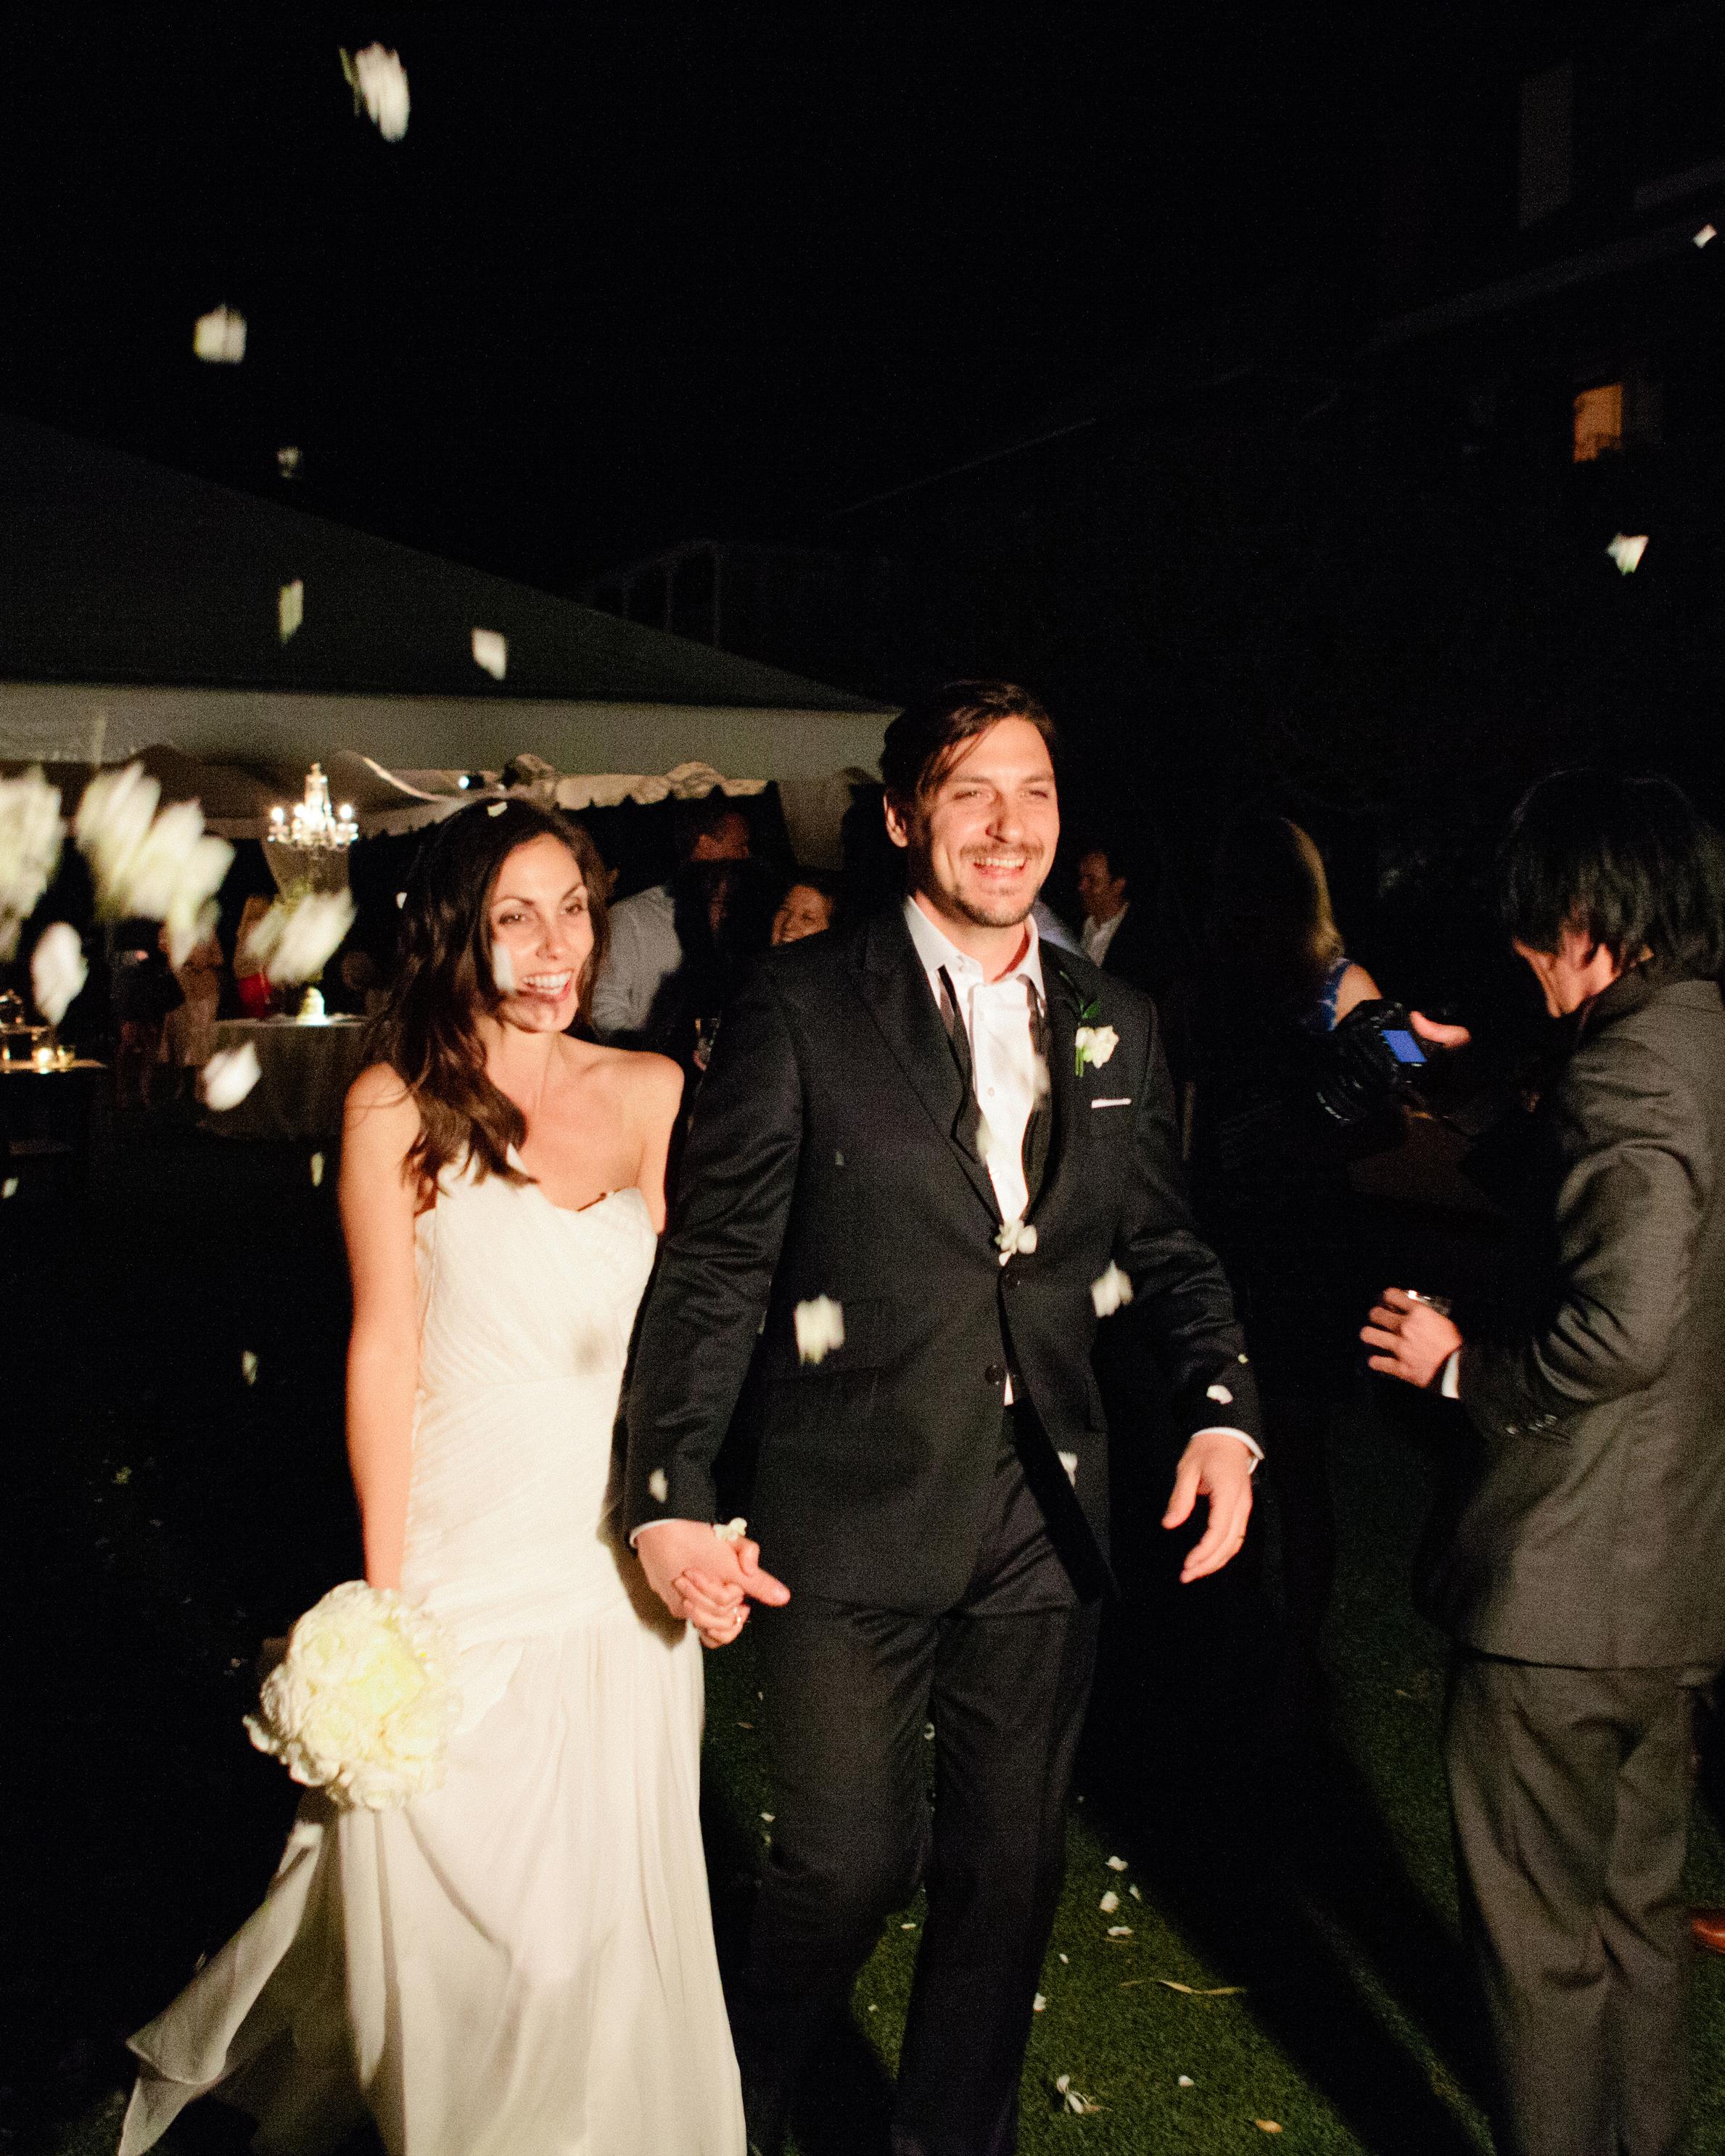 jennifer-adrien-wedding-exit-0614.jpg